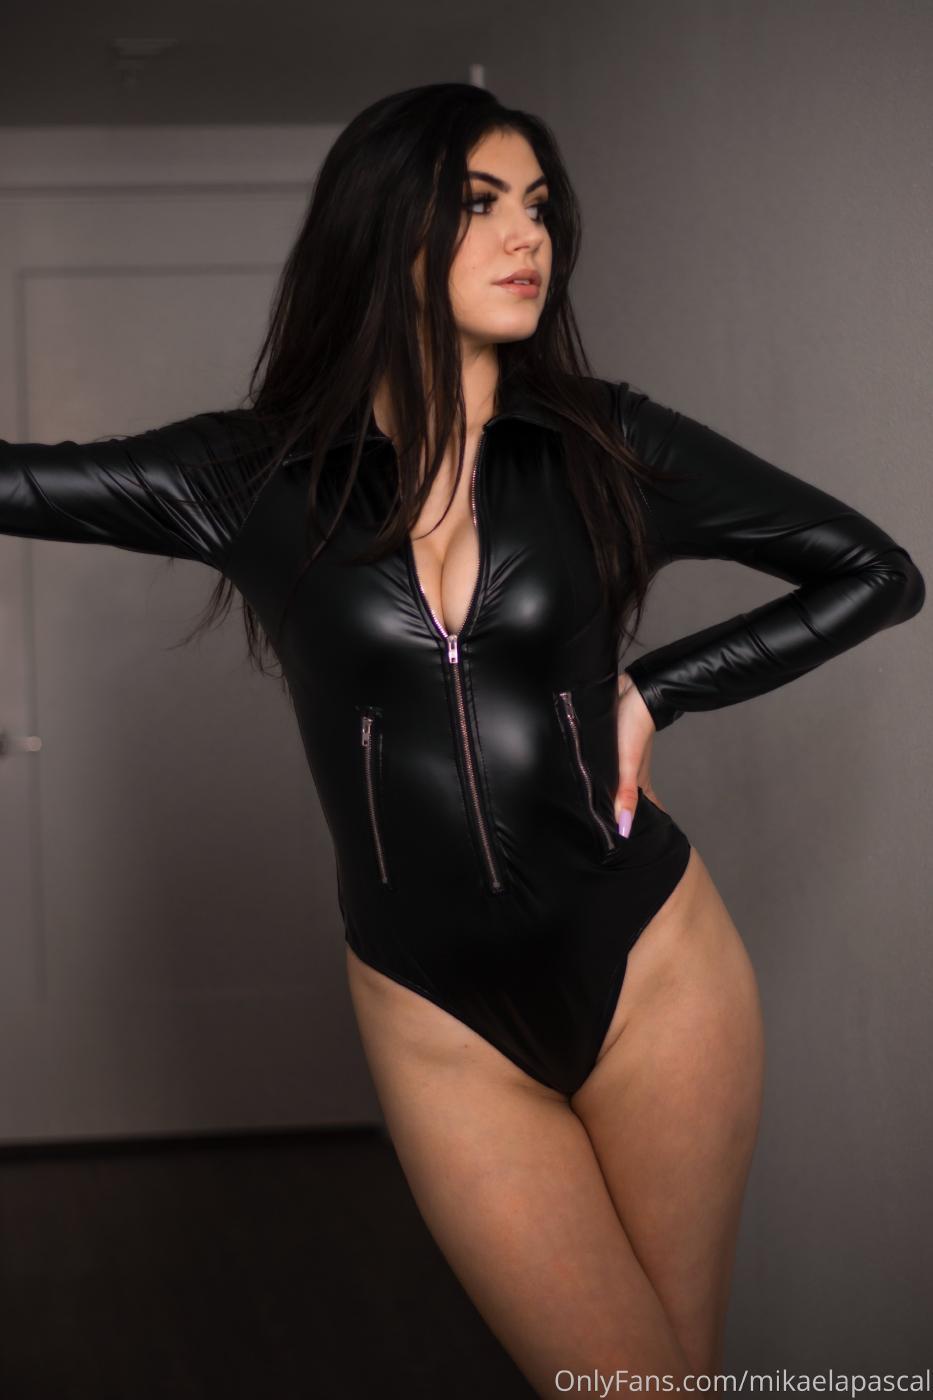 Mikaela Pascal Sexy Leather Bodysuit Onlyfans Set Leaked 0024